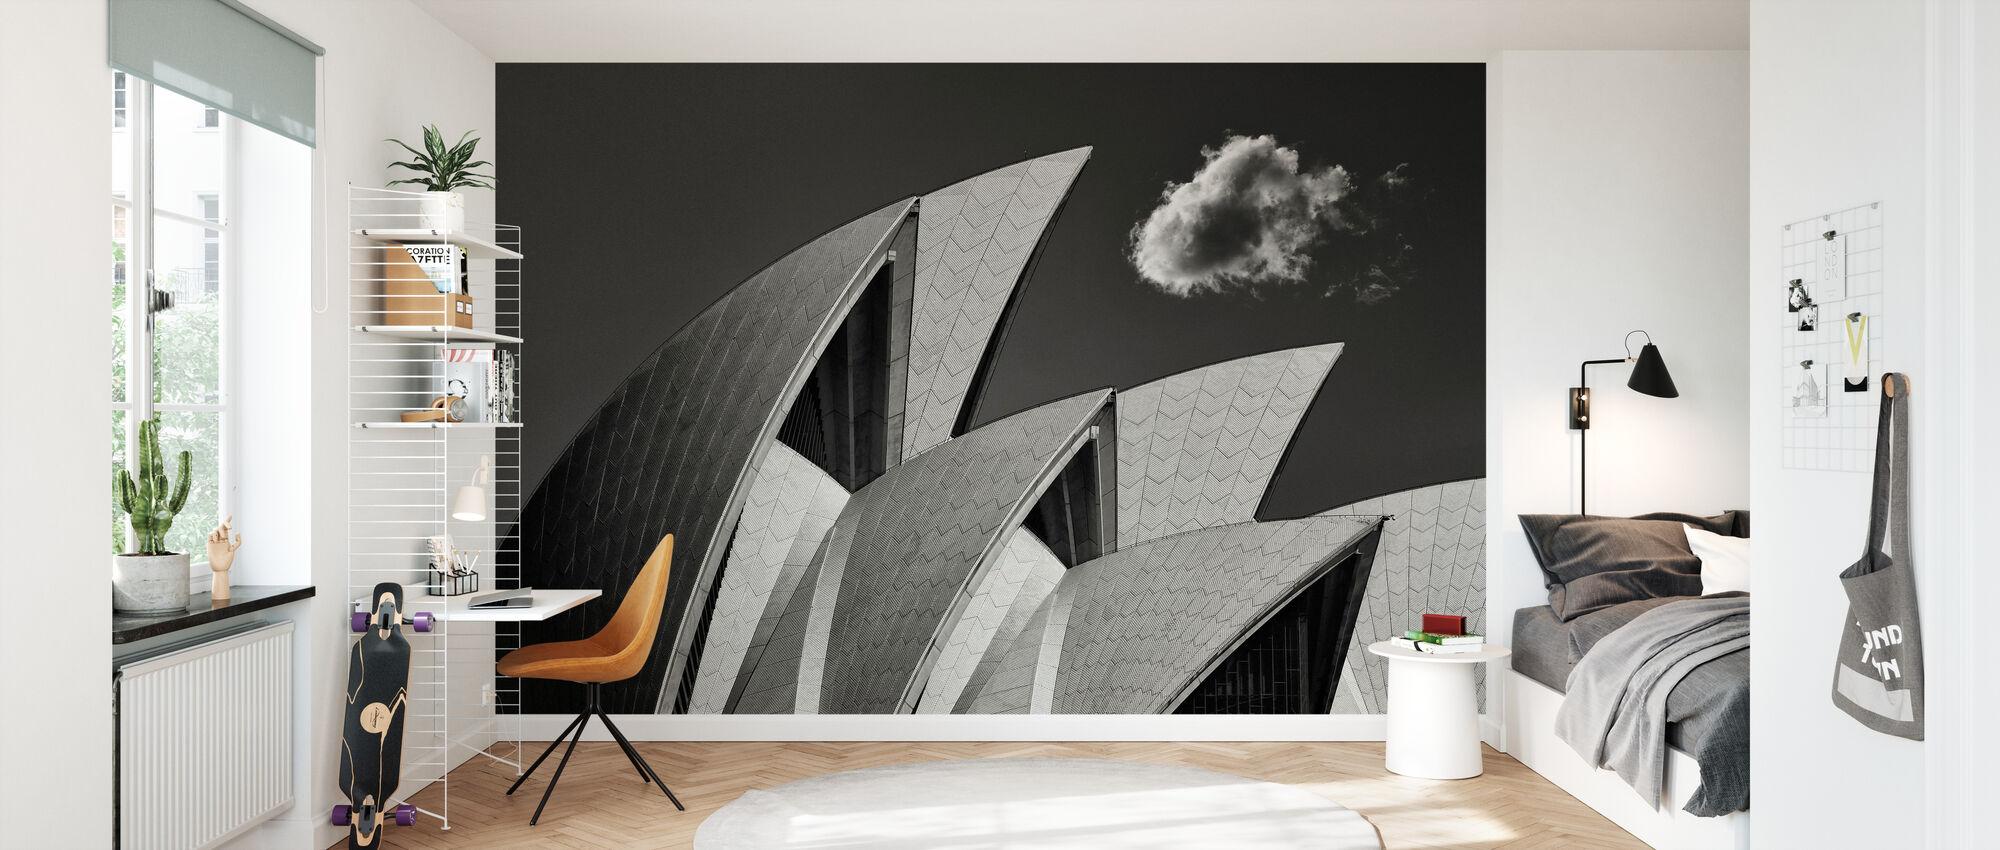 Glup - Wallpaper - Kids Room